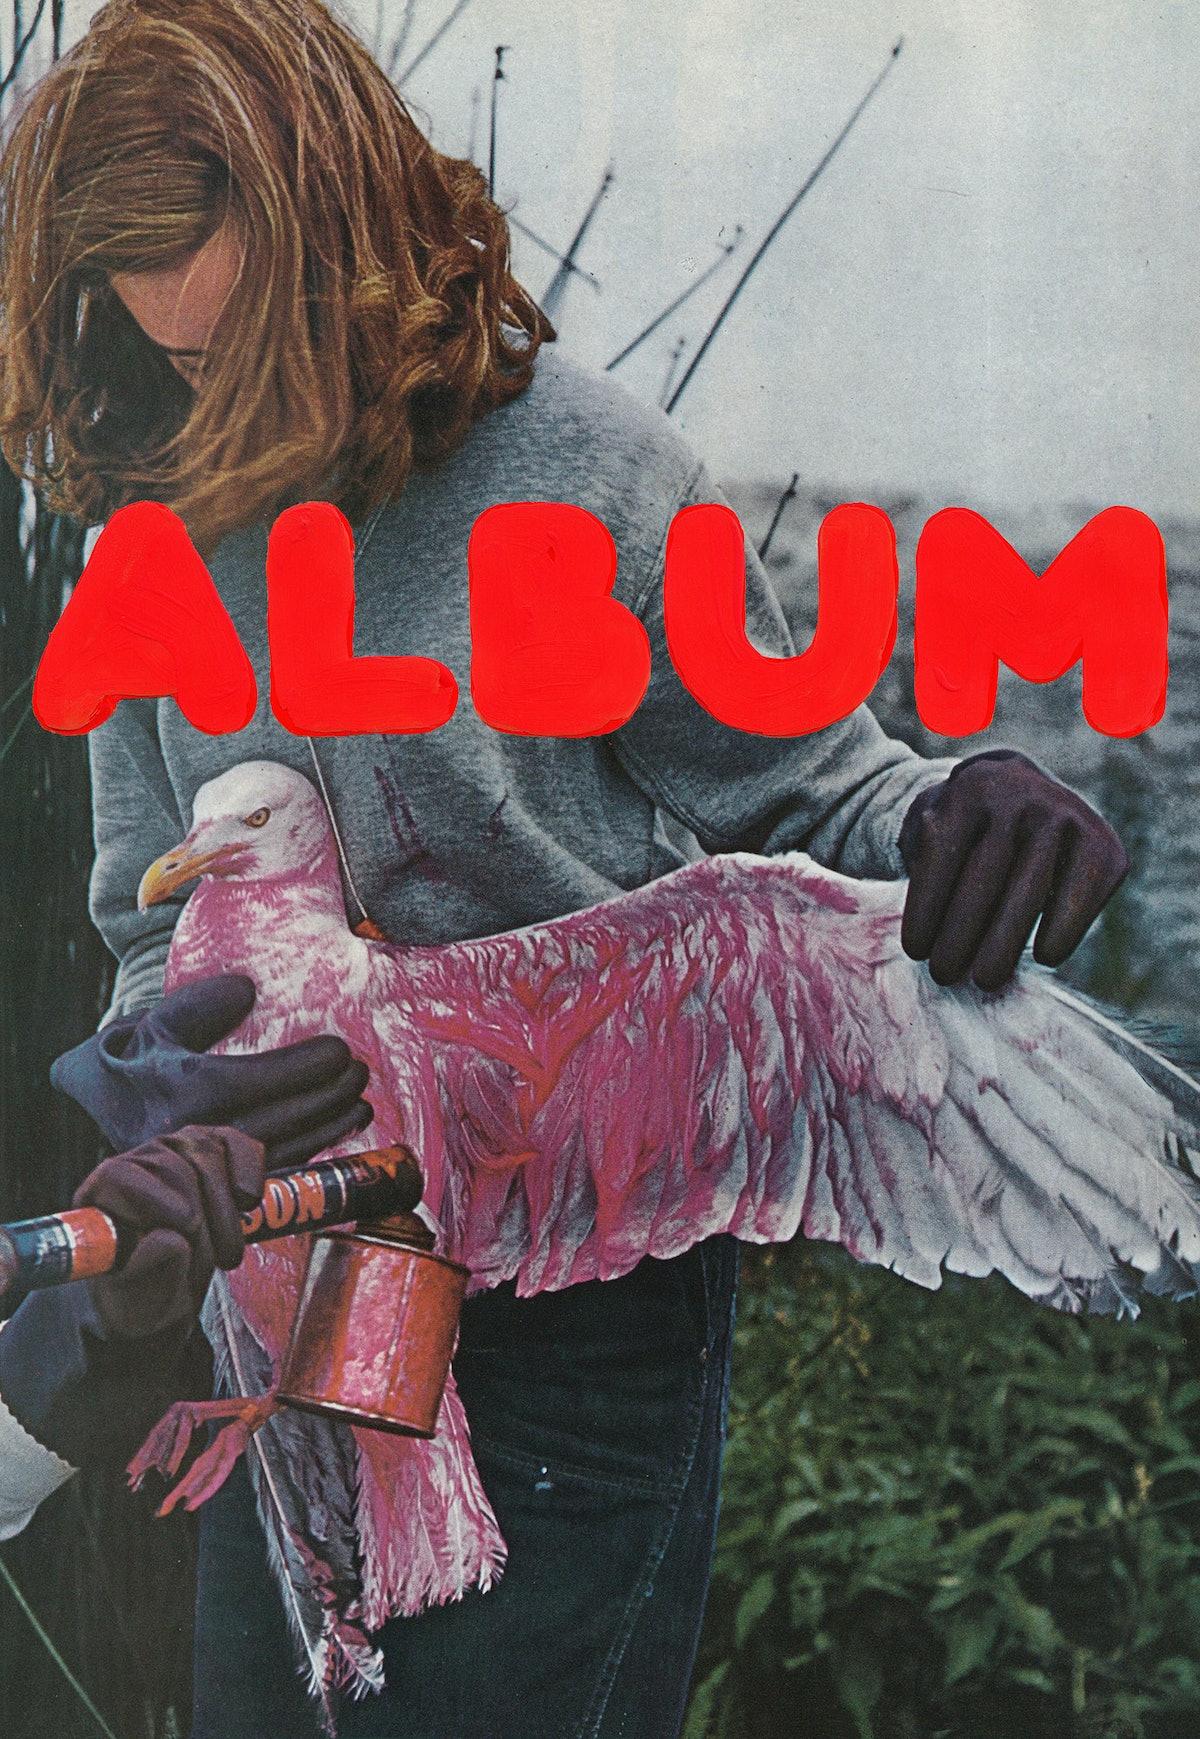 ALBUM by Eline Mugaas and Elise Storsveen